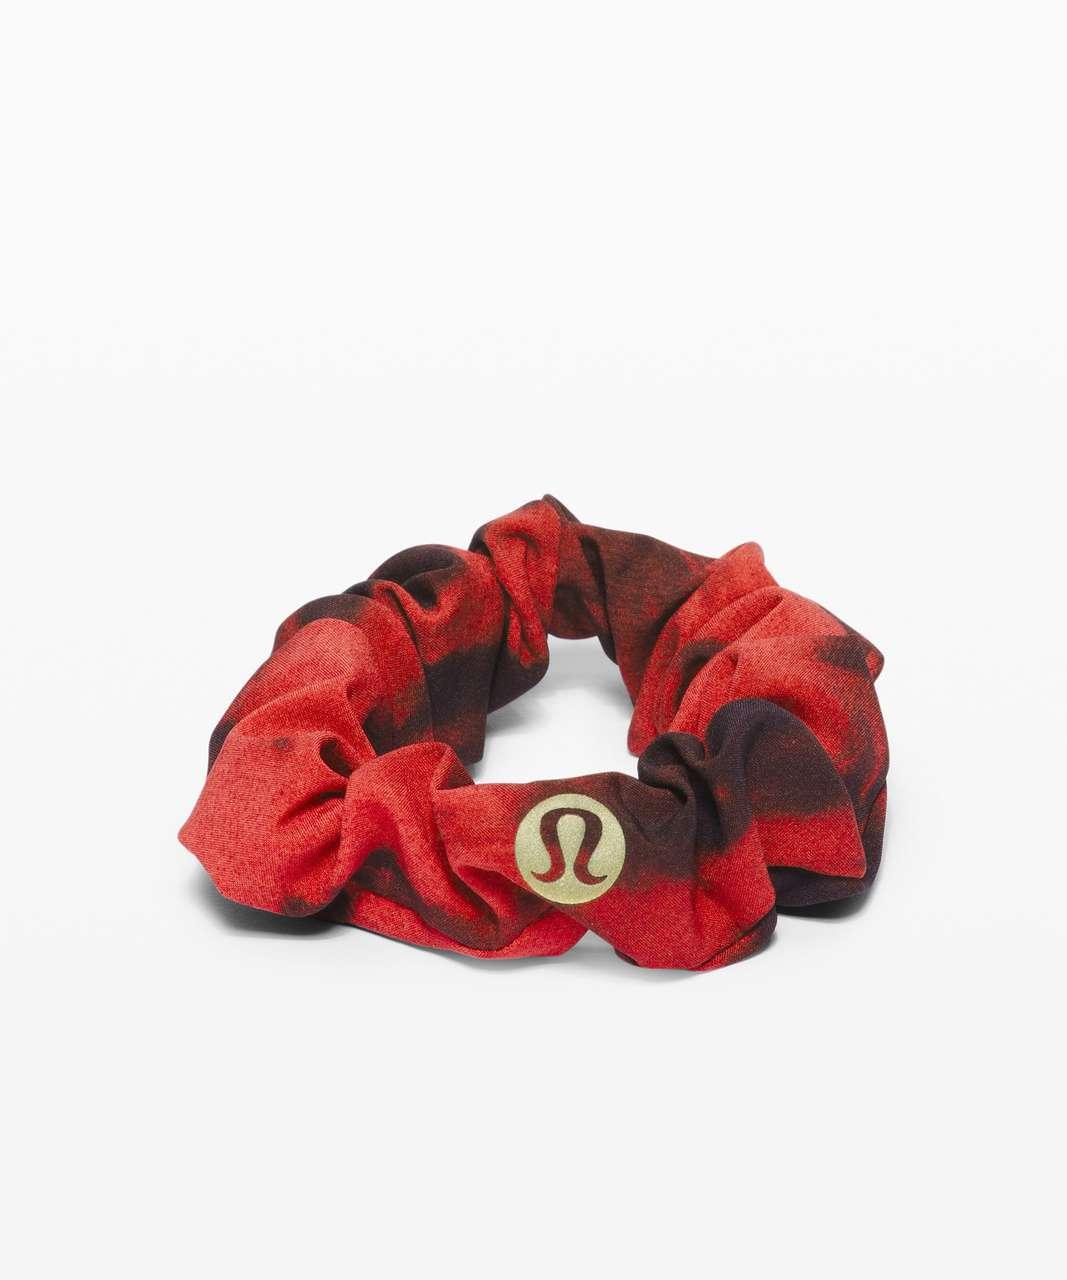 Lululemon Uplifting Scrunchie *Game Day - Game Day Red Black Multi